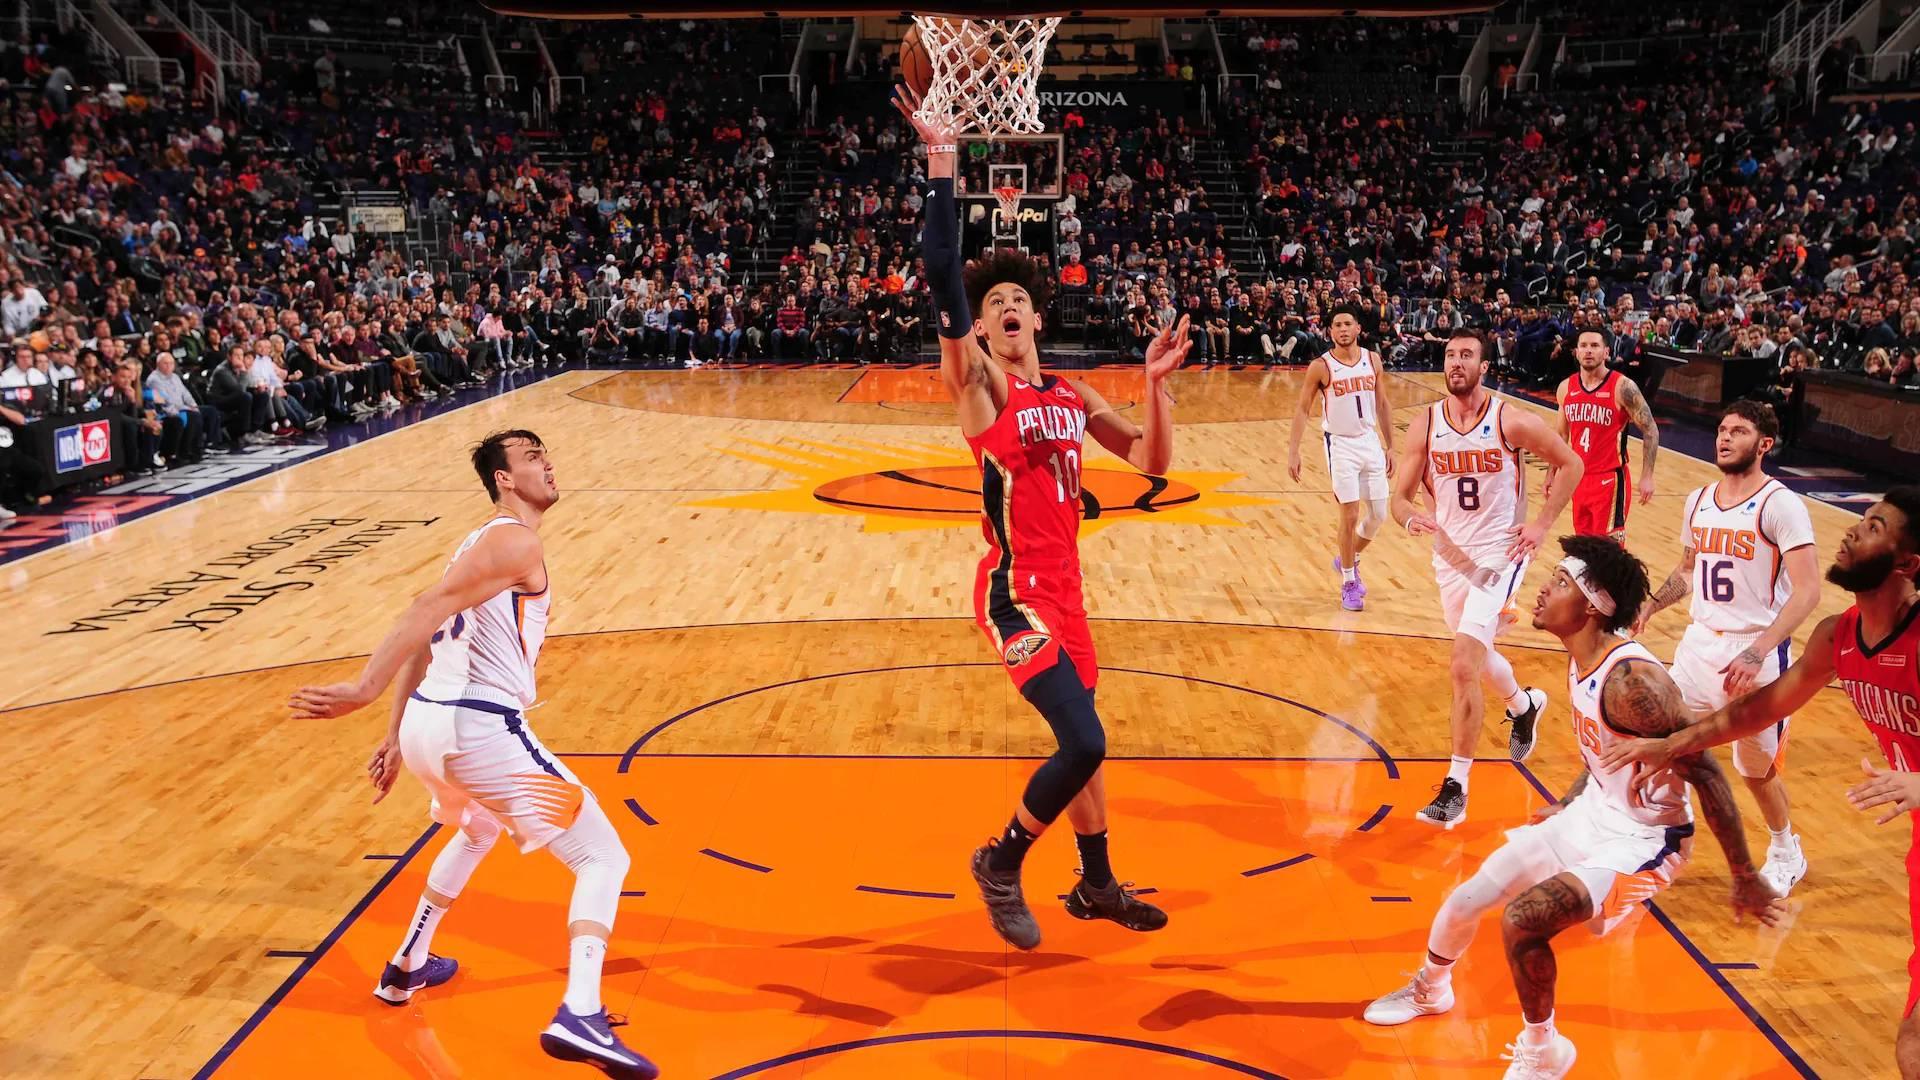 2019-2020 NBA常规赛 菲尼克斯太阳 VS 新奥尔良鹈鹕 集锦Part1